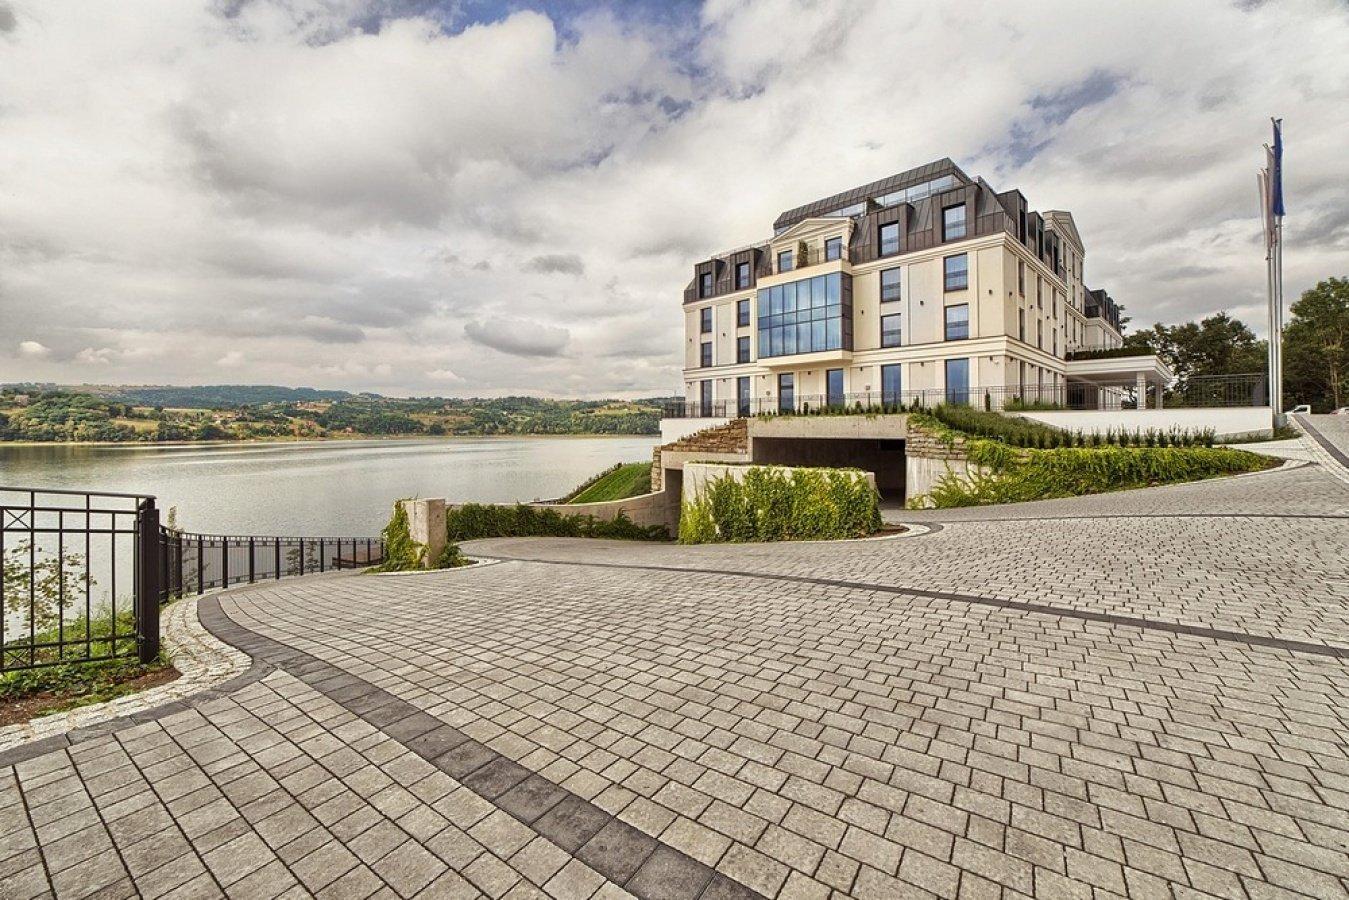 Heron Live Hotel - luksusowy hotel nad jeziorem